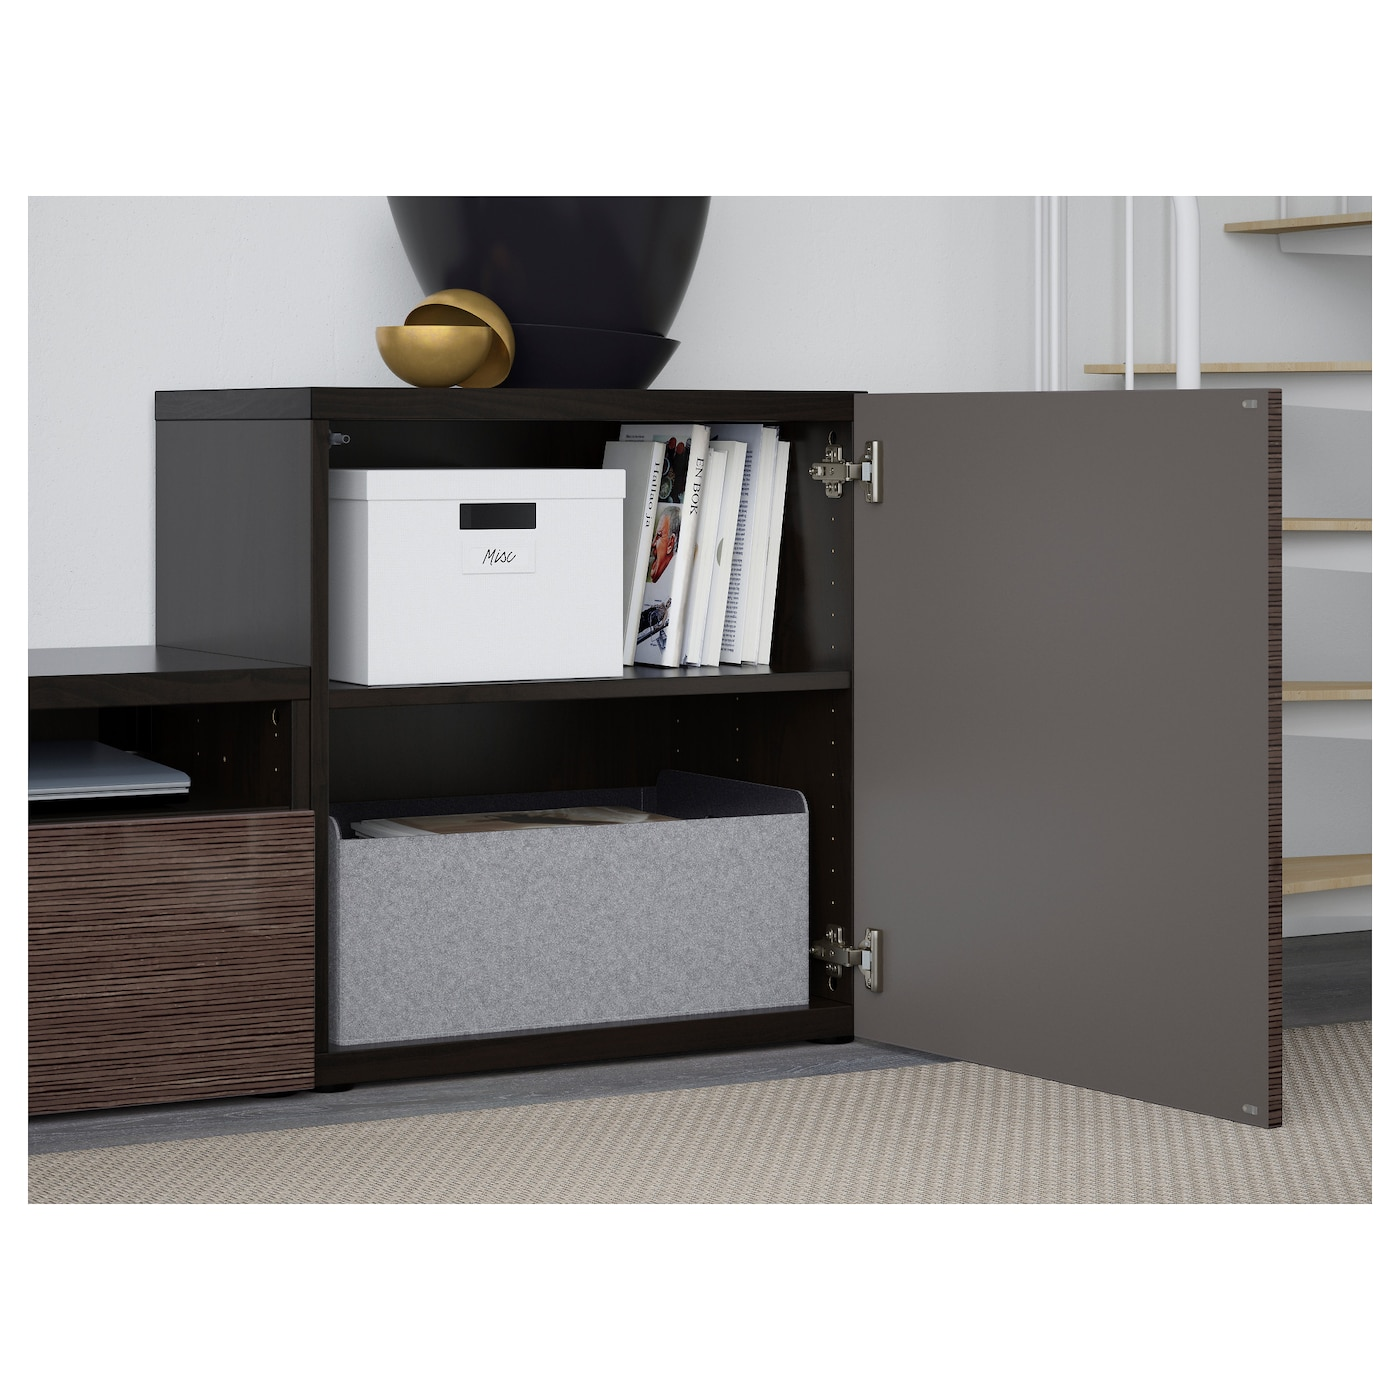 Best mueble tv con almacenaje negro marr n selsviken alto brillo vidrioahumadomarr n 300 x 20 - Muebles almacenaje ikea ...